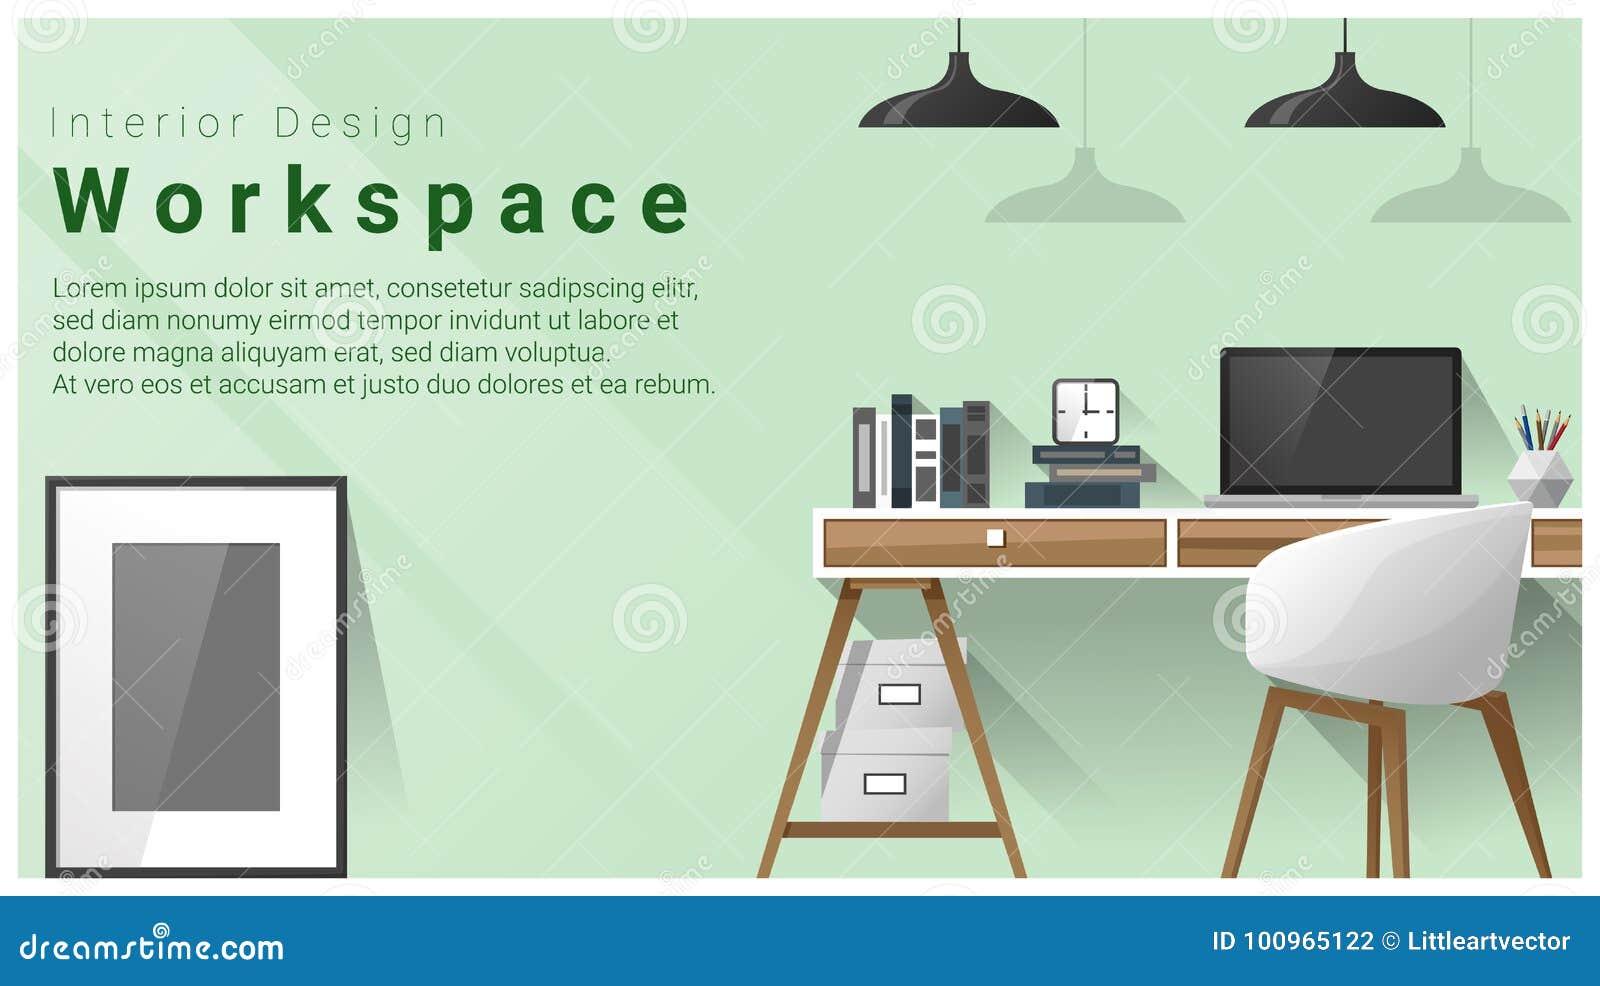 Interior design with Modern workplace background